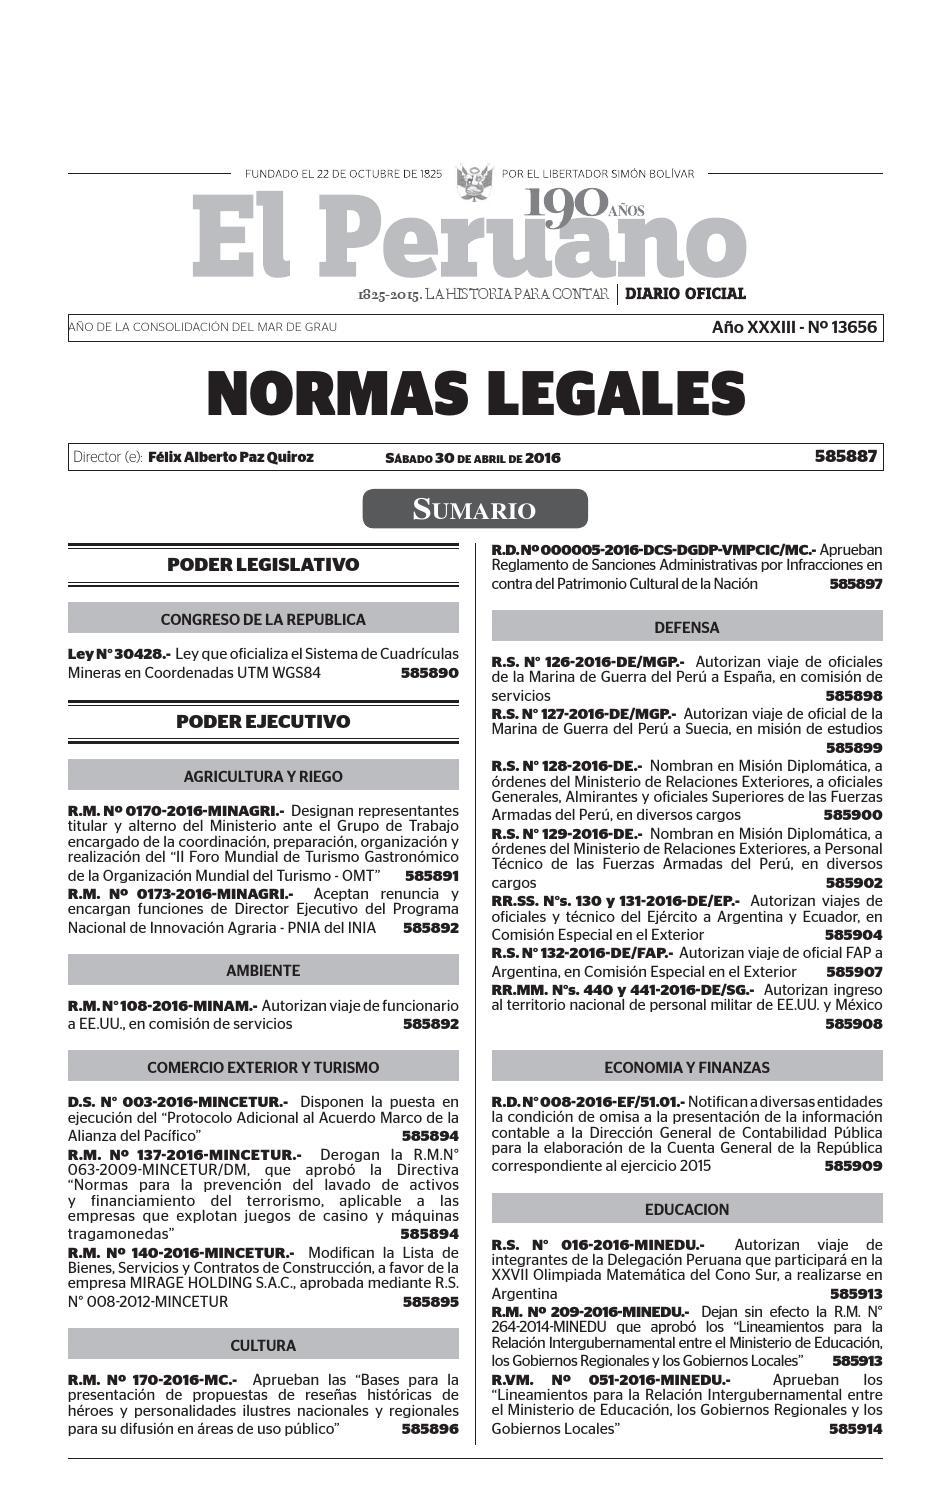 Normas Legales 30 04 2016 by Gaceta Juridica - issuu